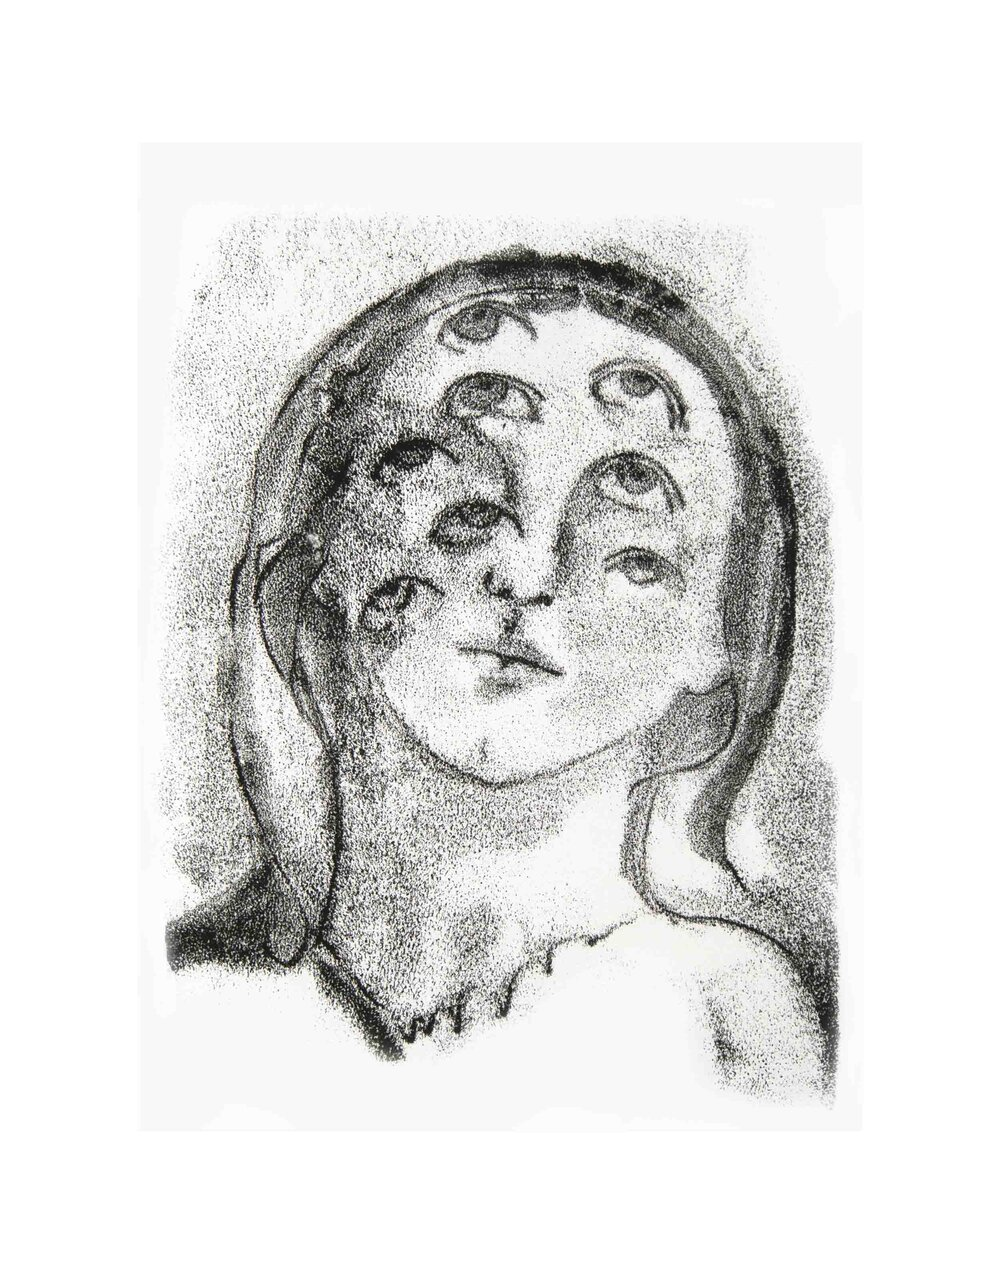 Mother Madonna